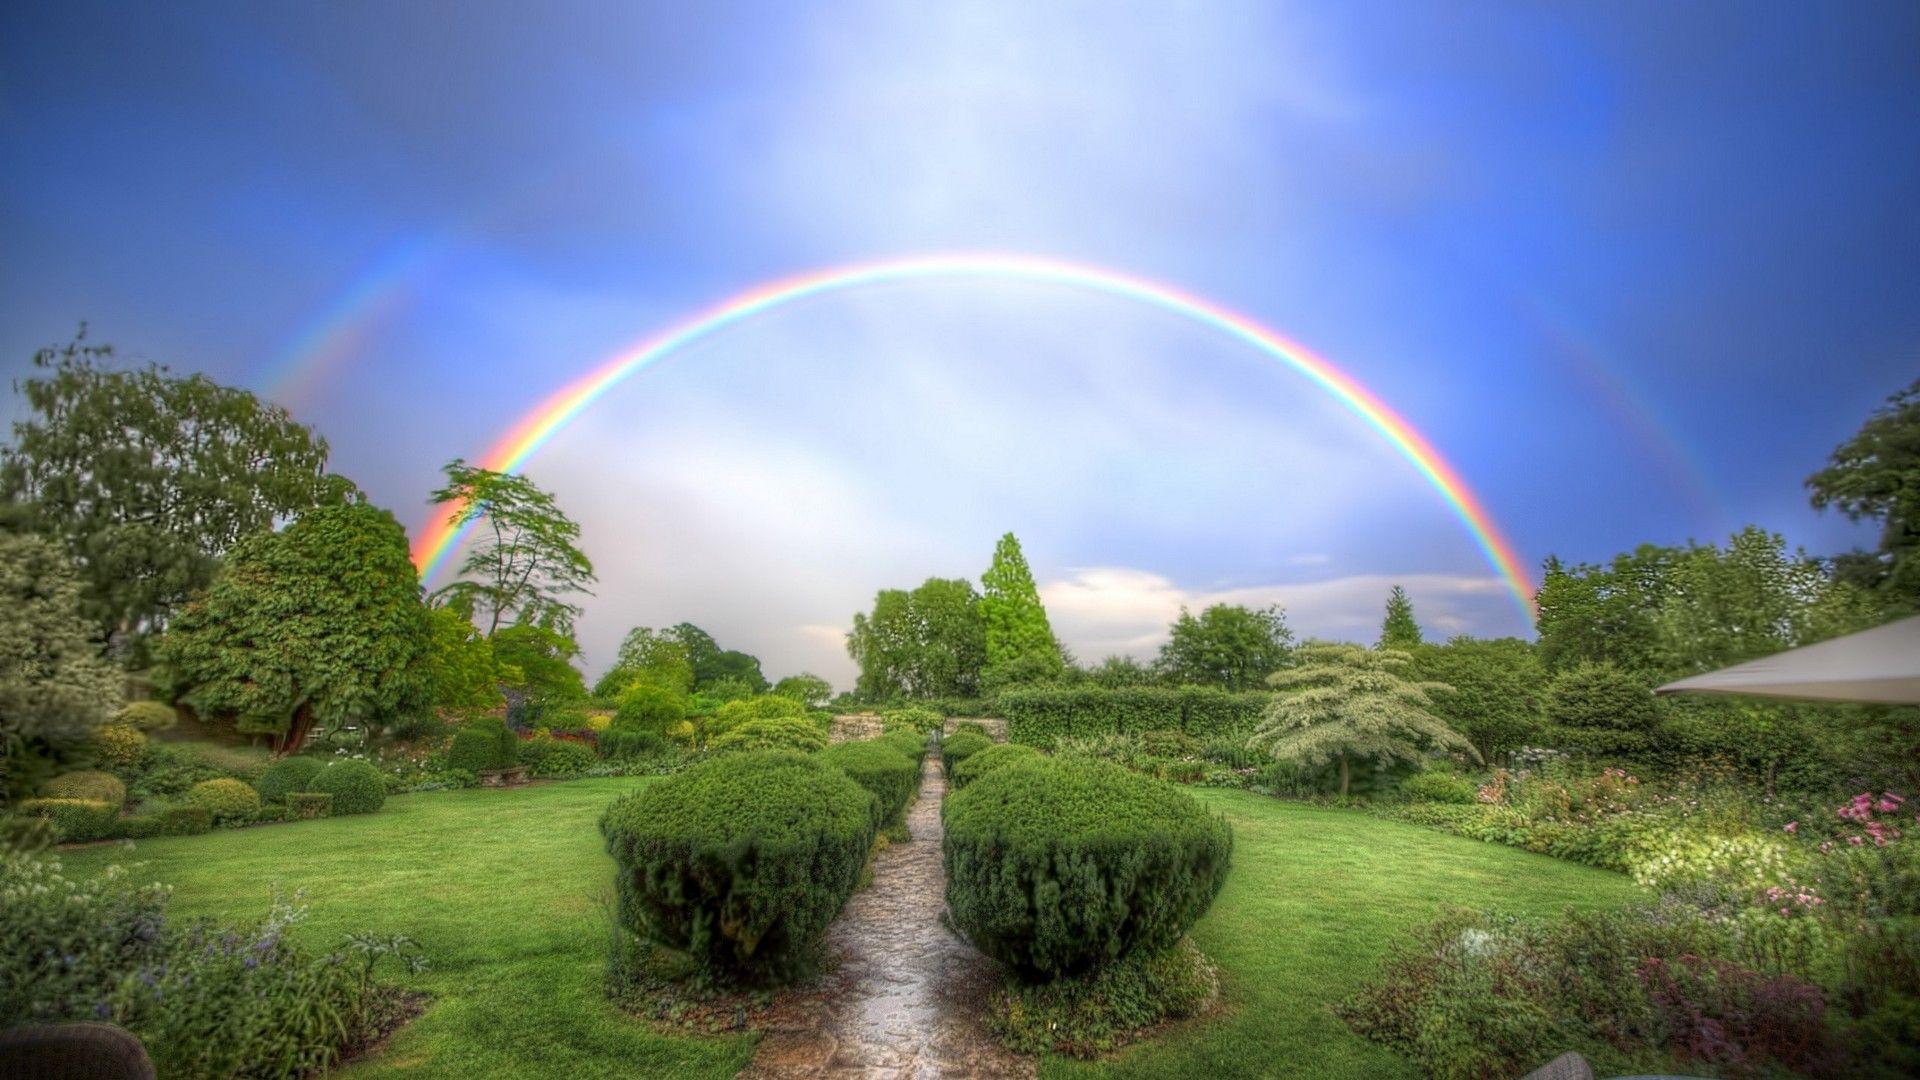 Rainbow Colors Desktop Wallpaper Best Wallpaper Hd New Nature Wallpaper Sky Garden Rainbow Wallpaper Iphone